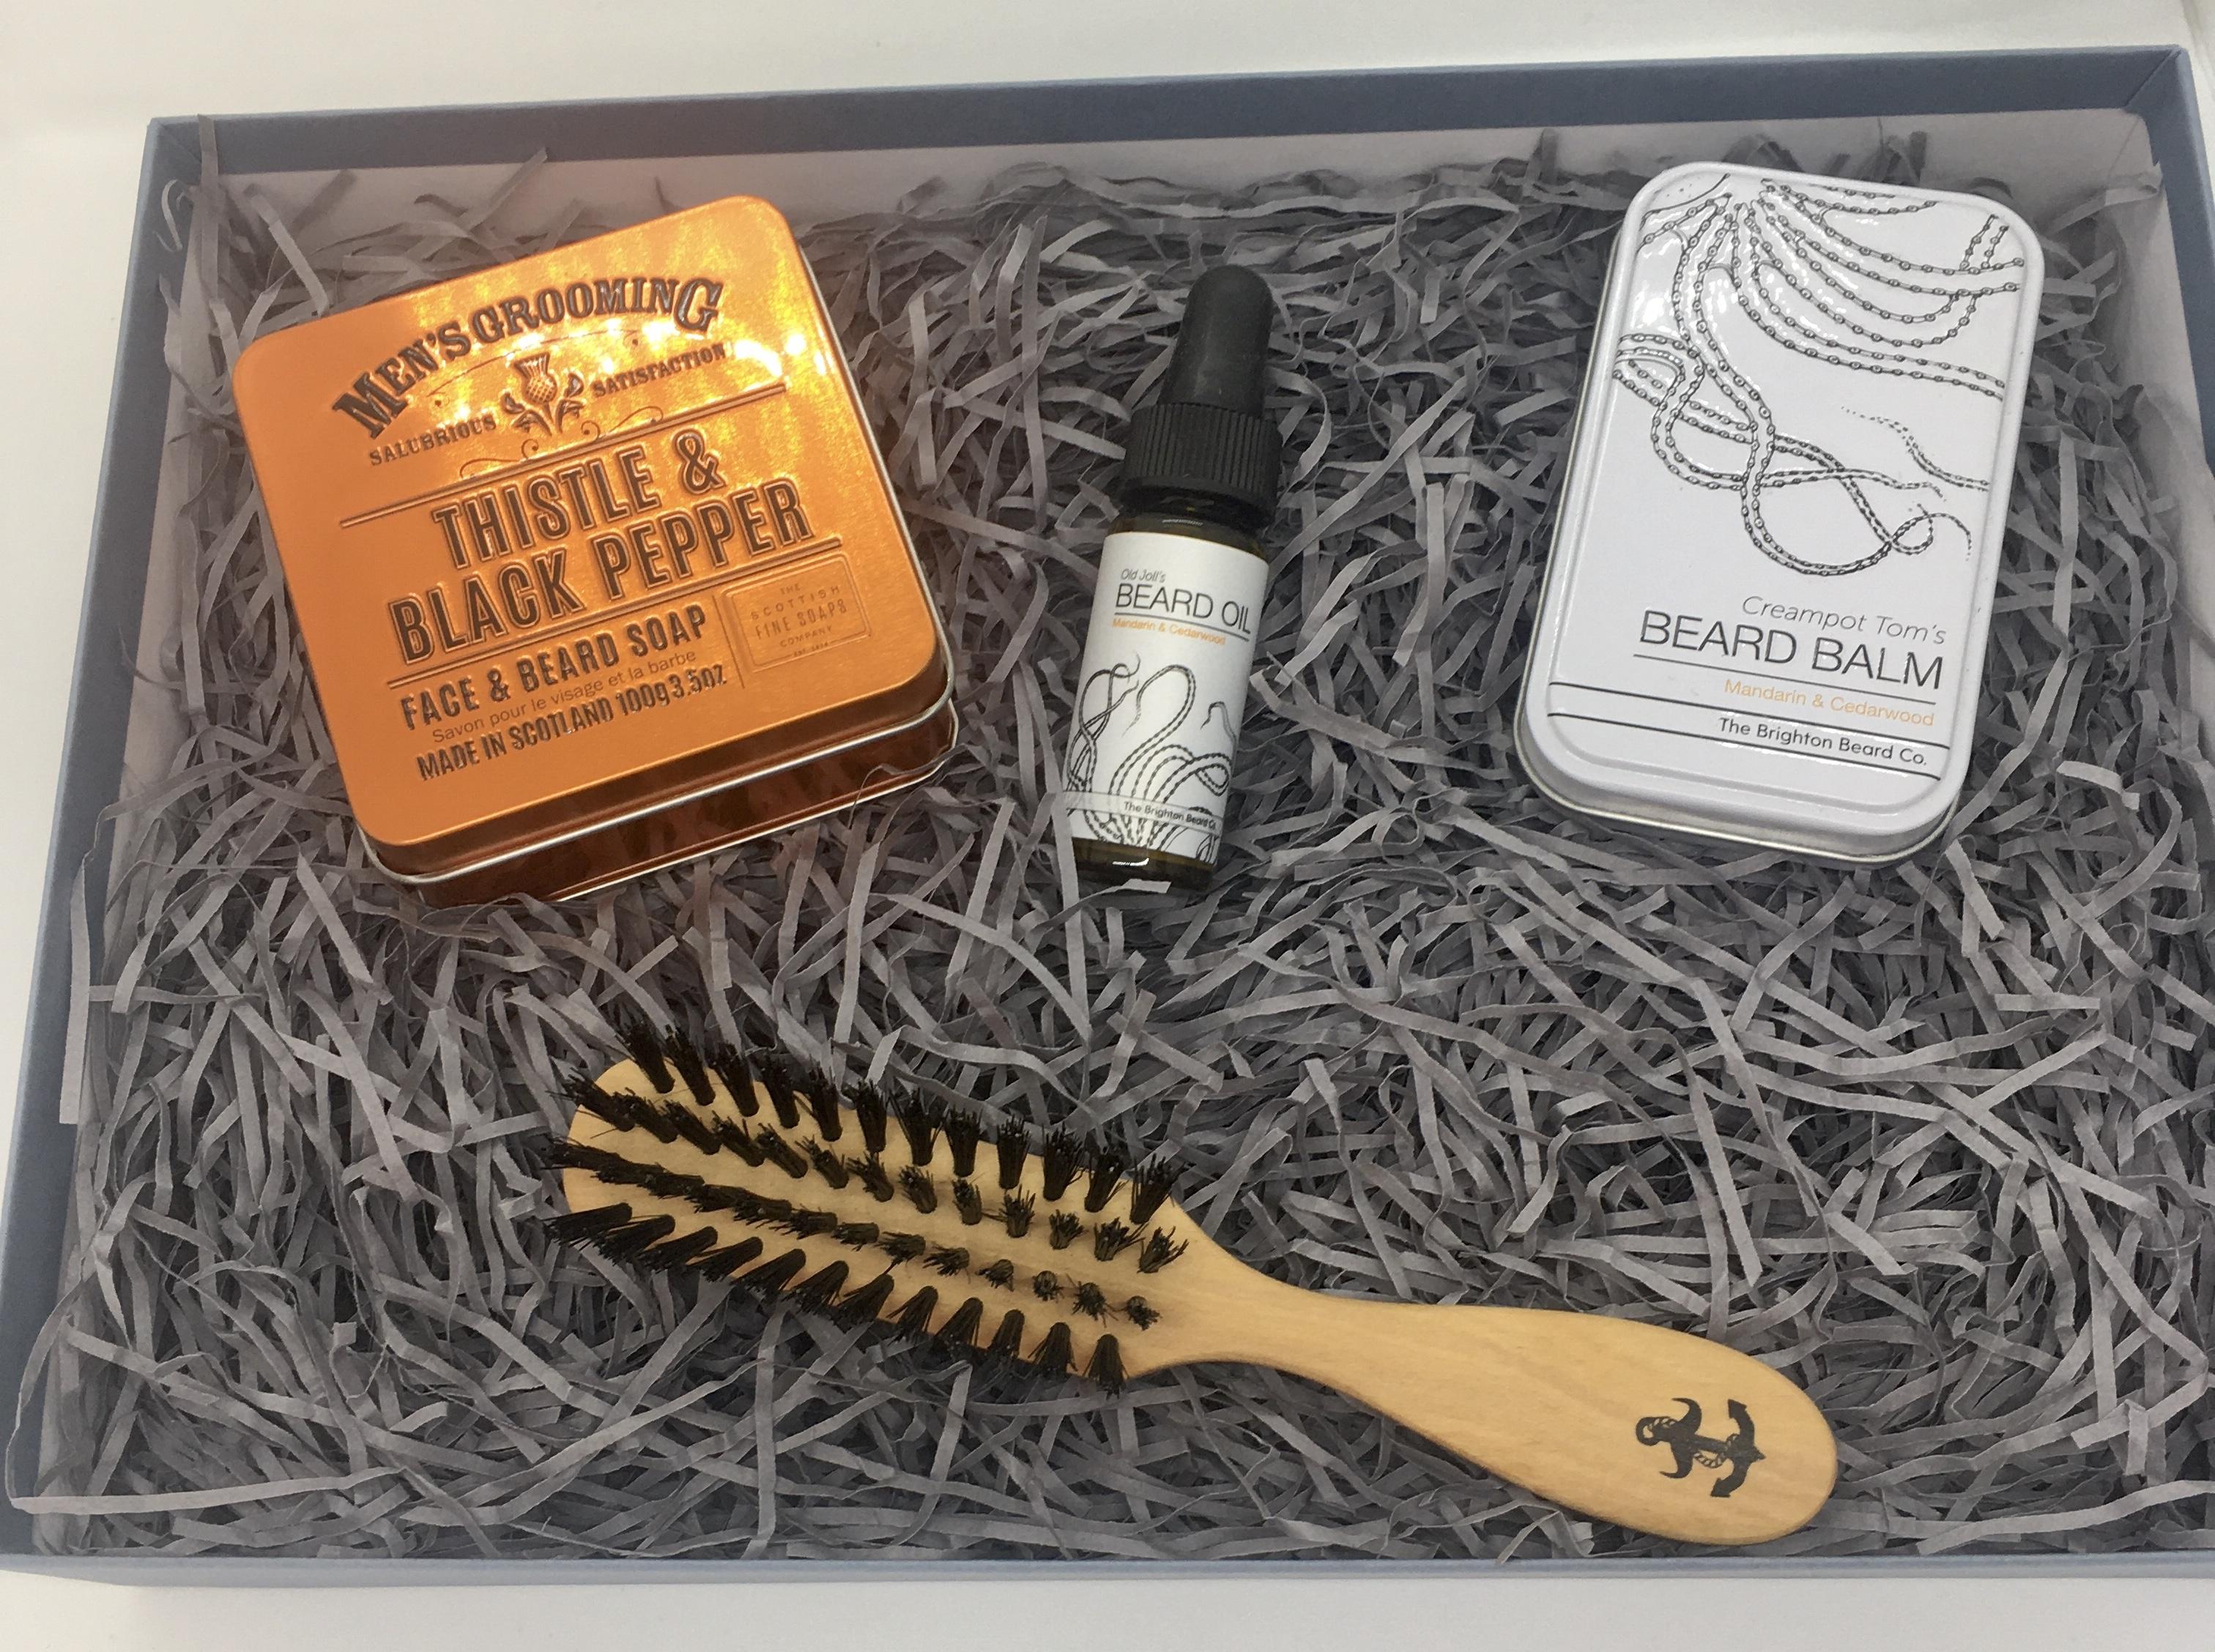 Beard soap, beard brush, oil and balm gift box